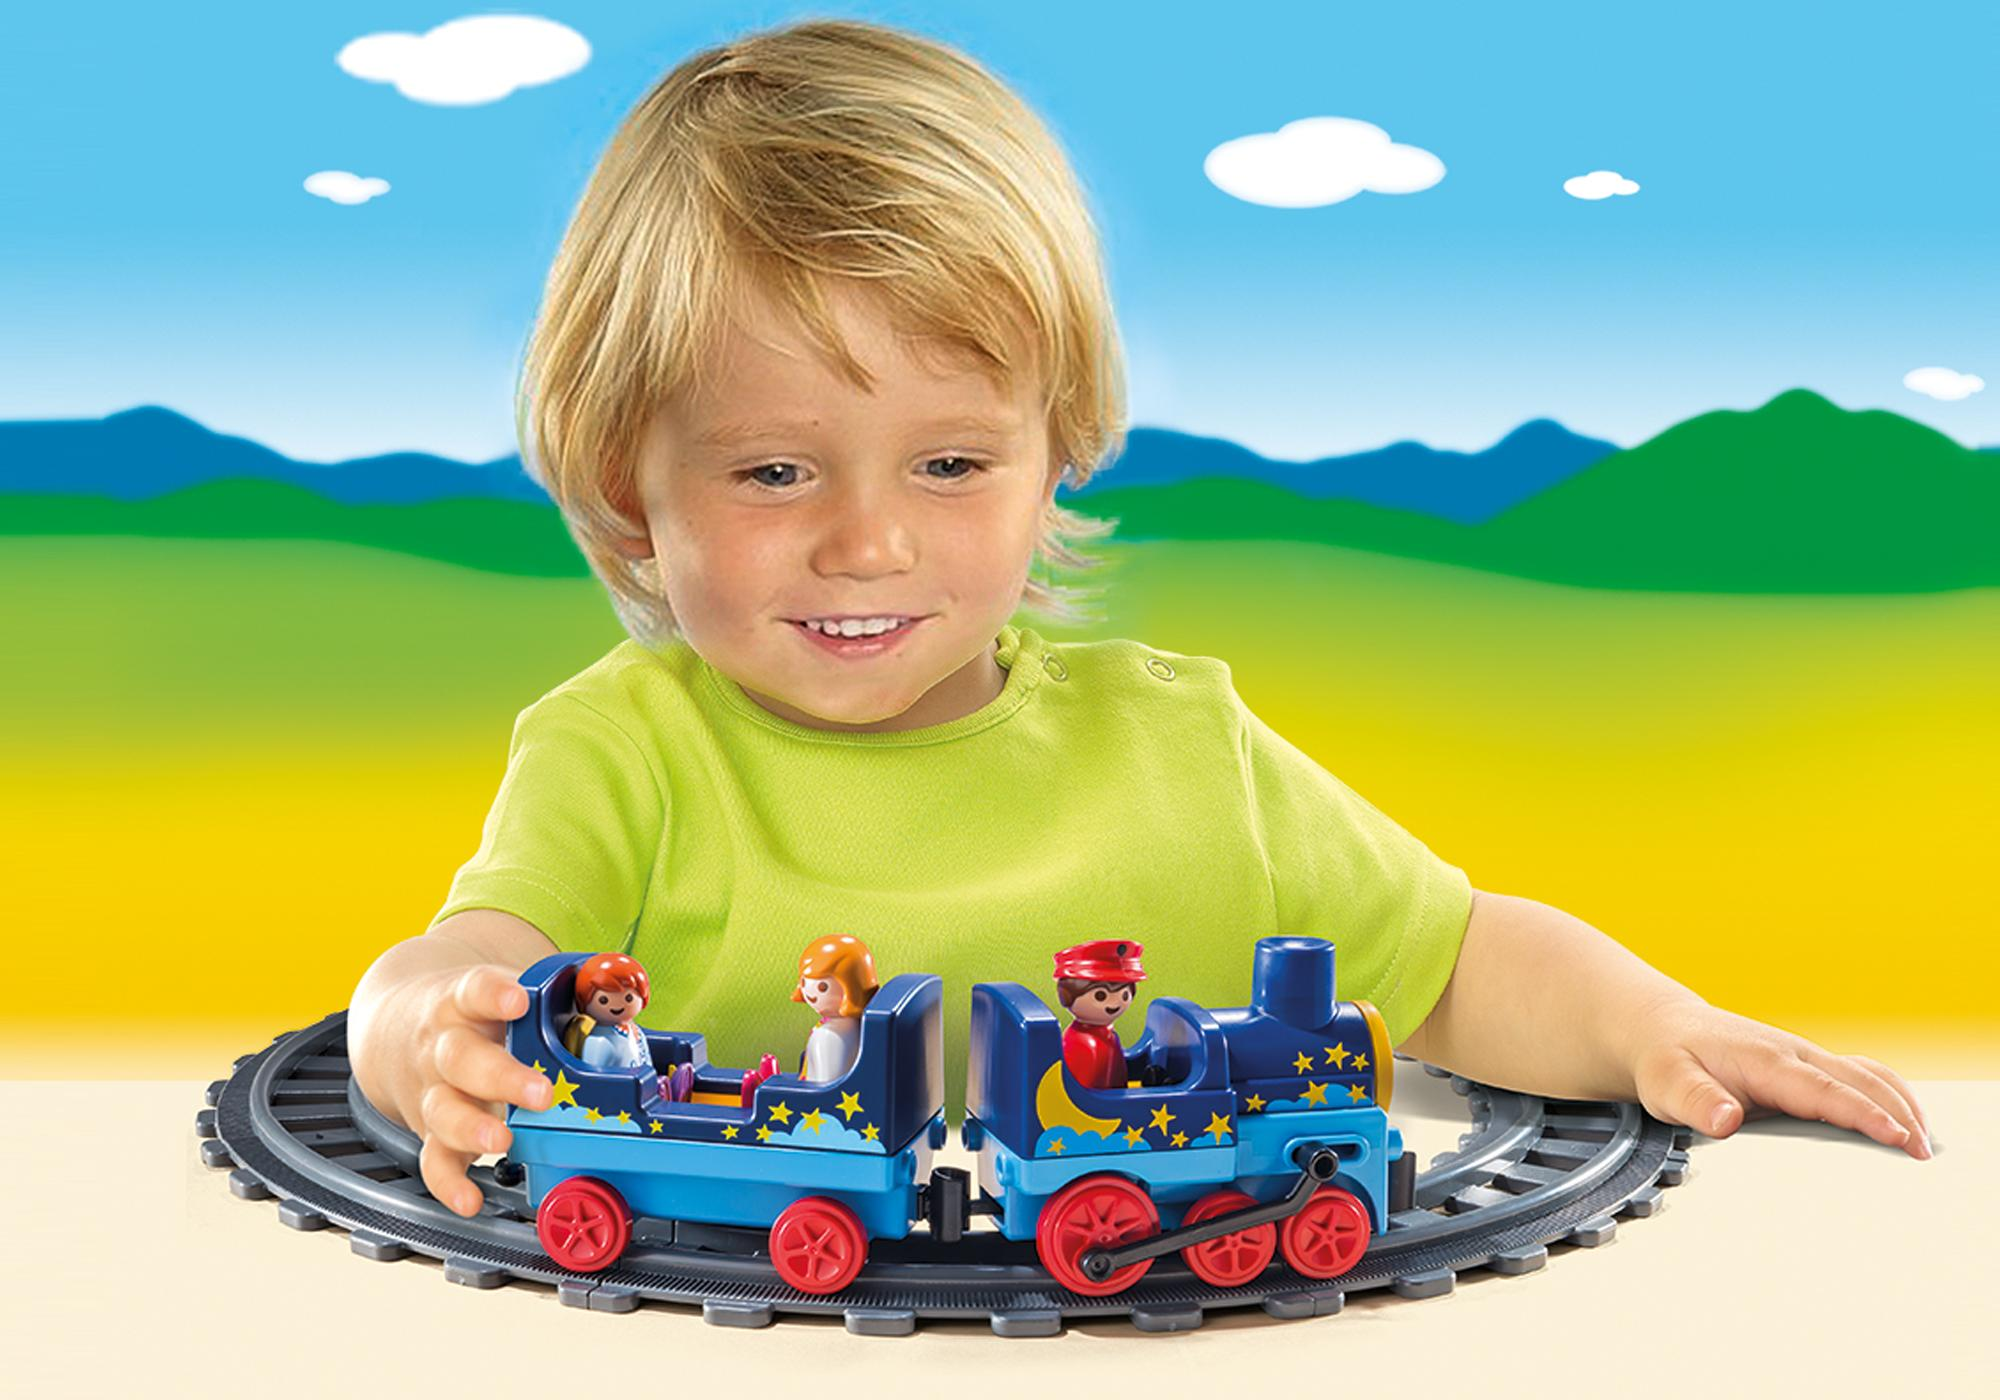 http://media.playmobil.com/i/playmobil/6880_product_extra2/Train étoilé avec passagers et rails